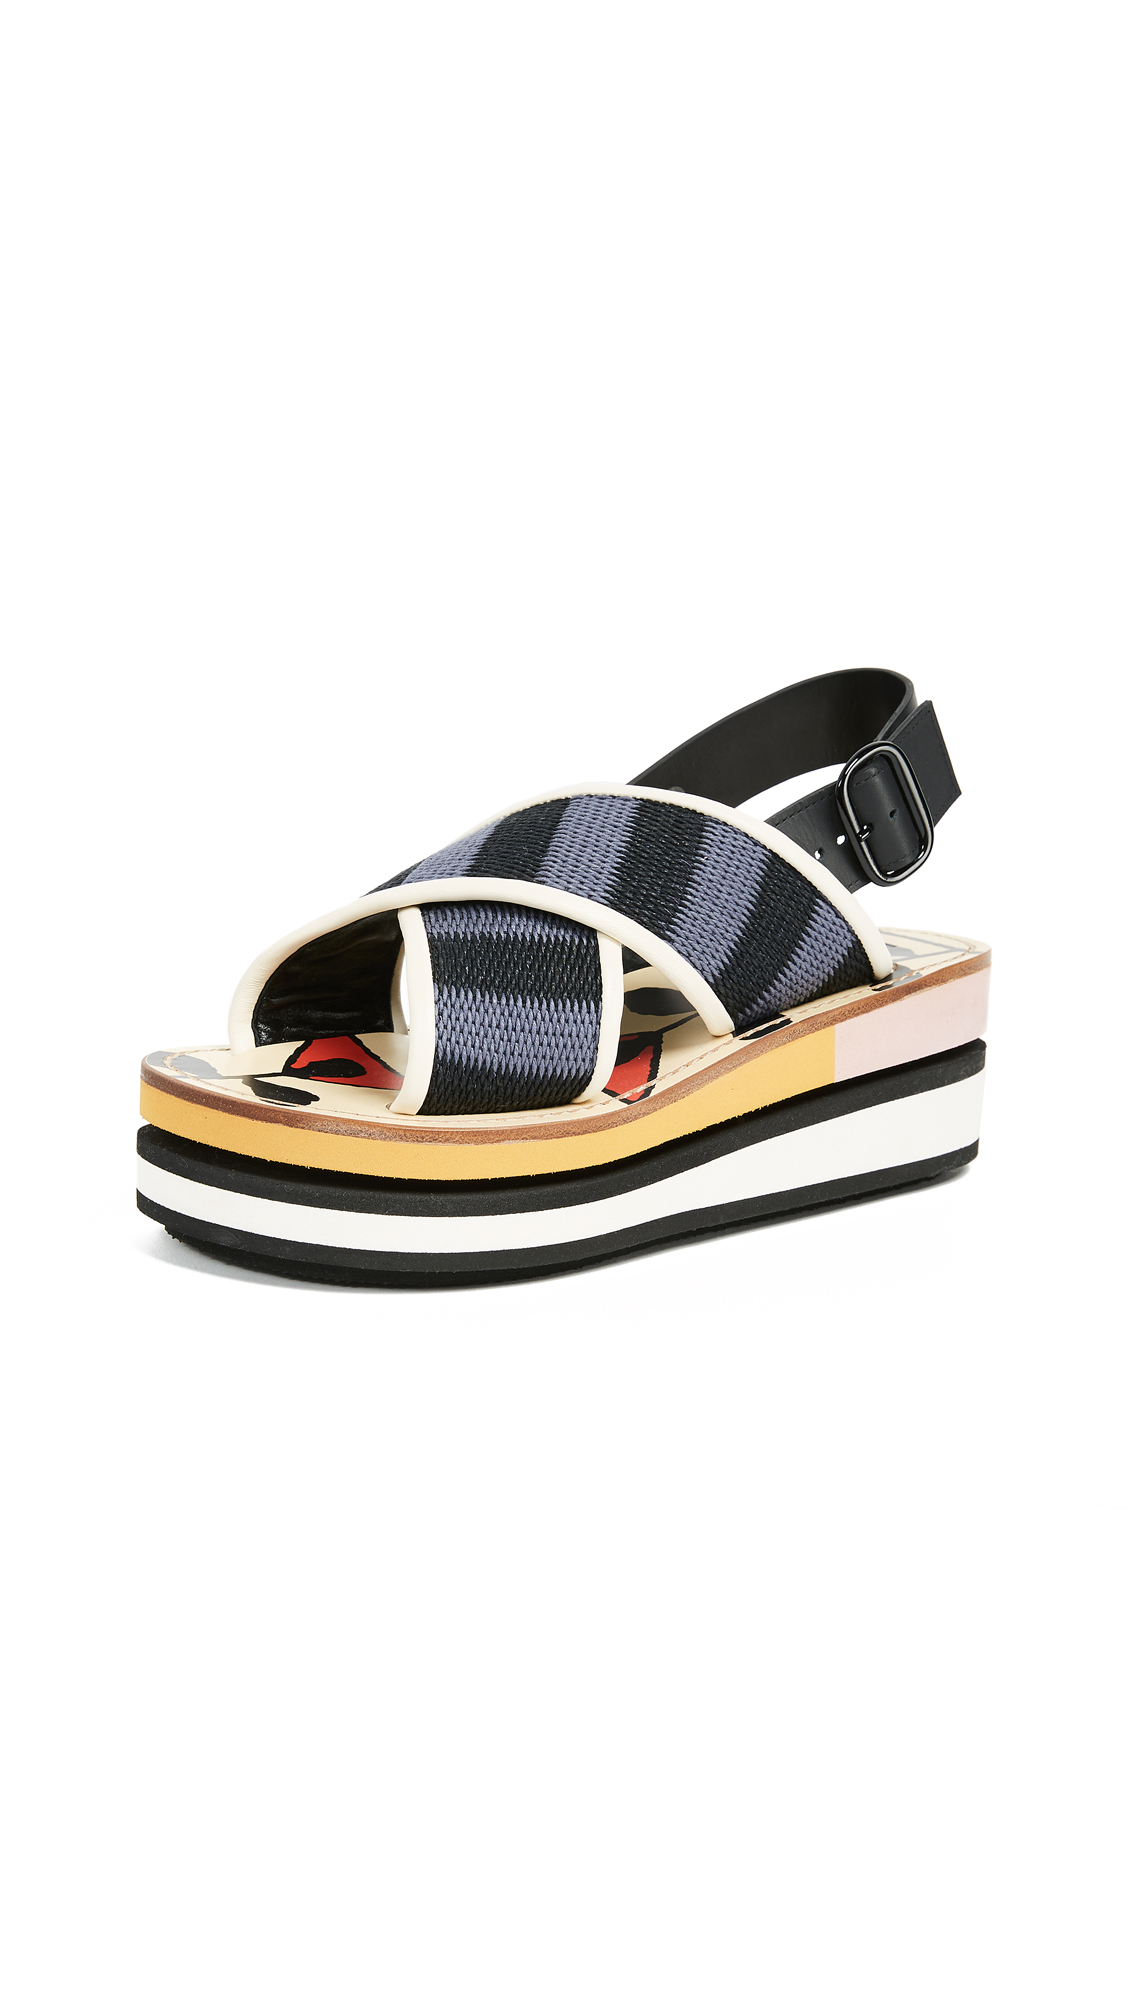 Marni Platform Sandals - Black/Cobalt